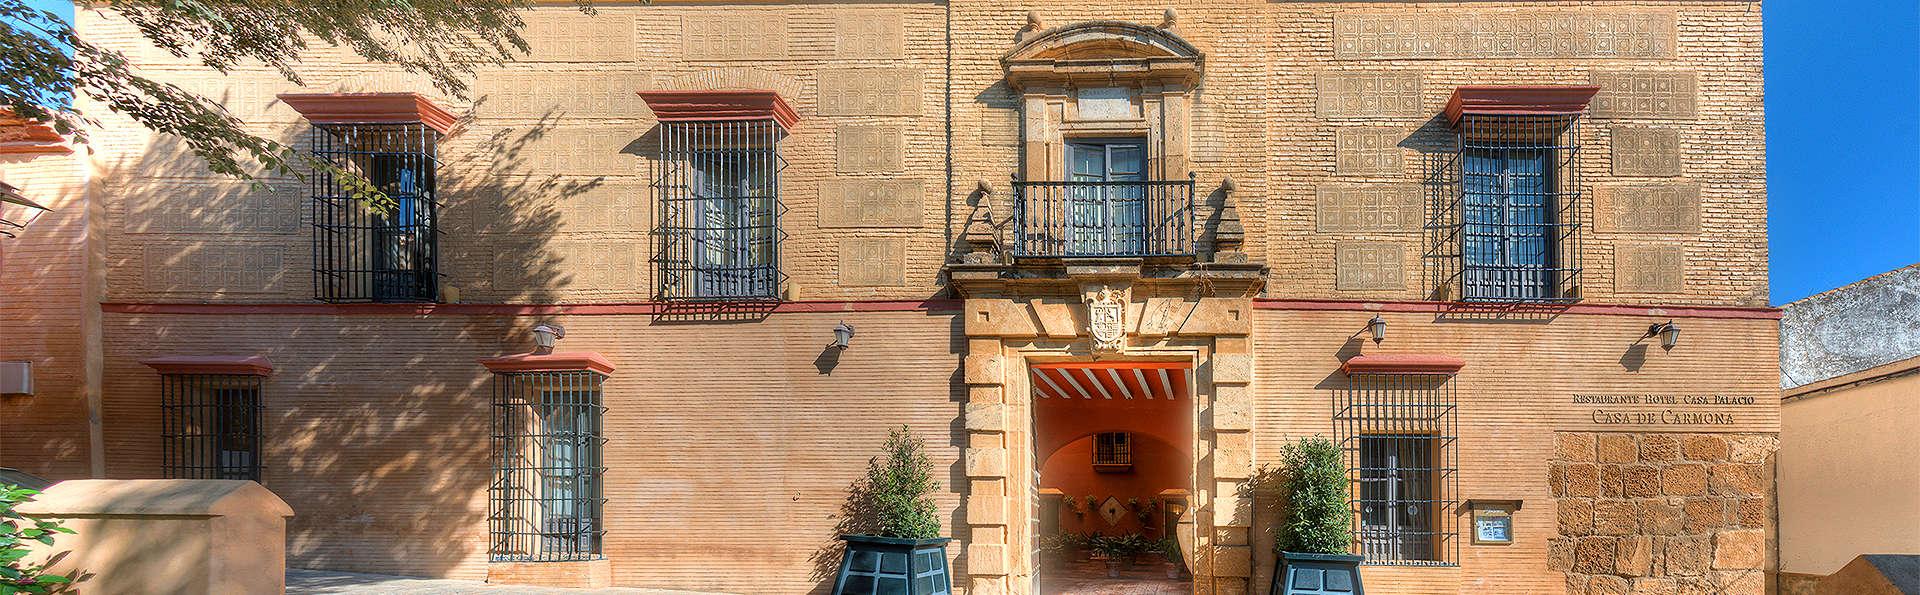 Casa Palacio de Carmona - EDIT_Exterior.jpg